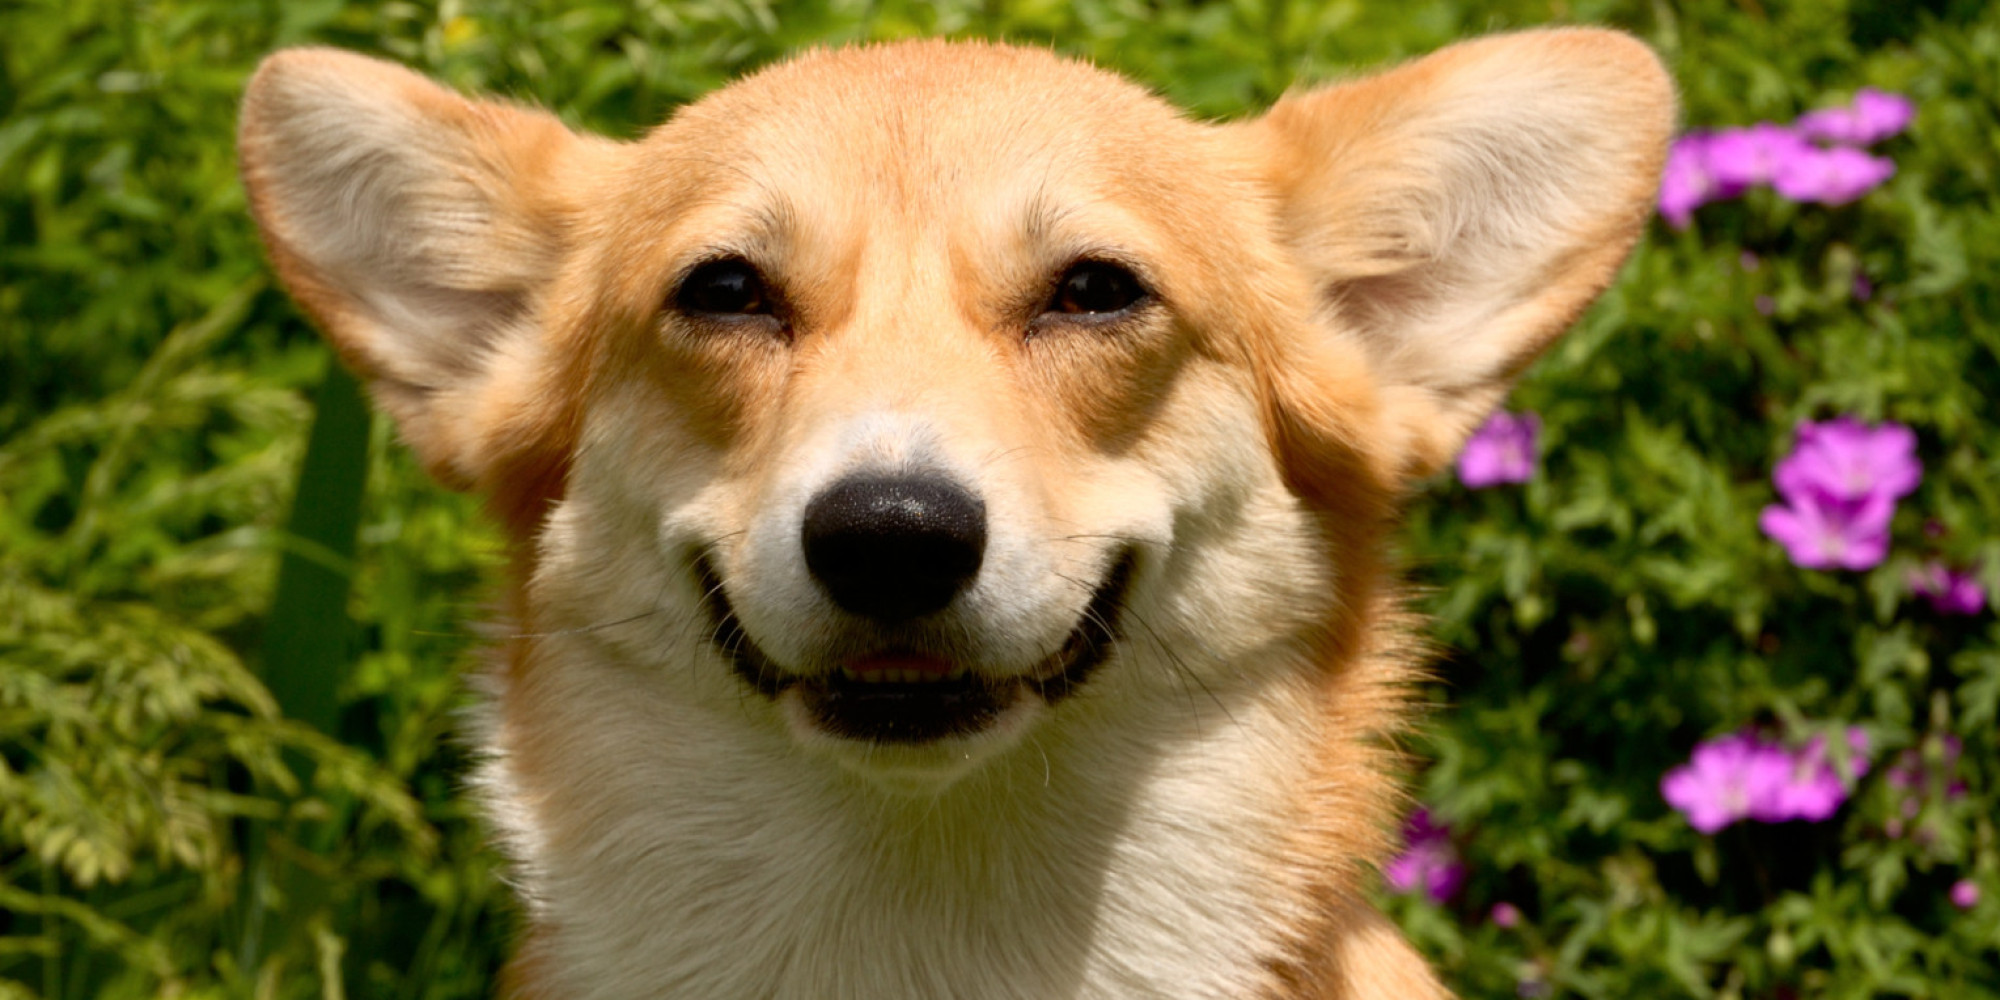 Cute Baby Puppy Pictures Wallpaper Bride On Craigslist Seeks Half A Dozen Corgis For Cutest